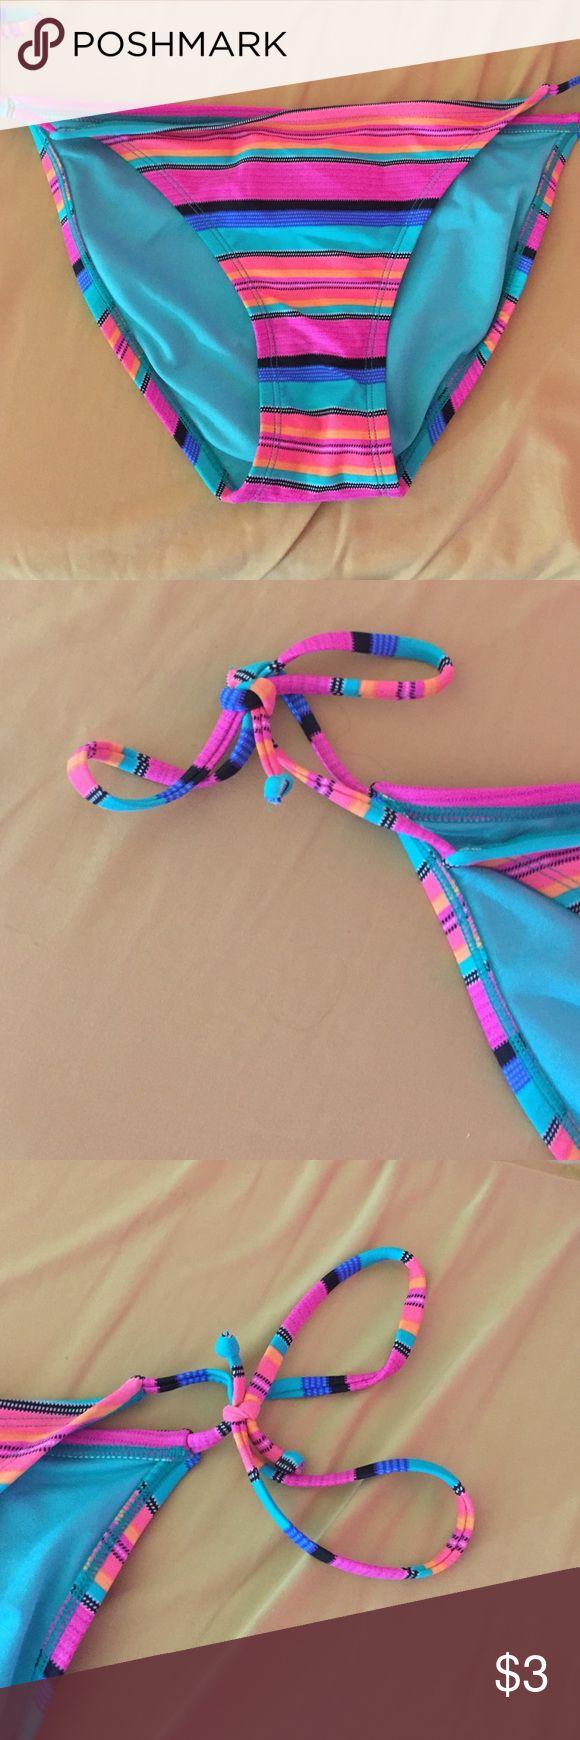 Multi colored bikini bottom Never been worn Xhilaration Swim Bikinis